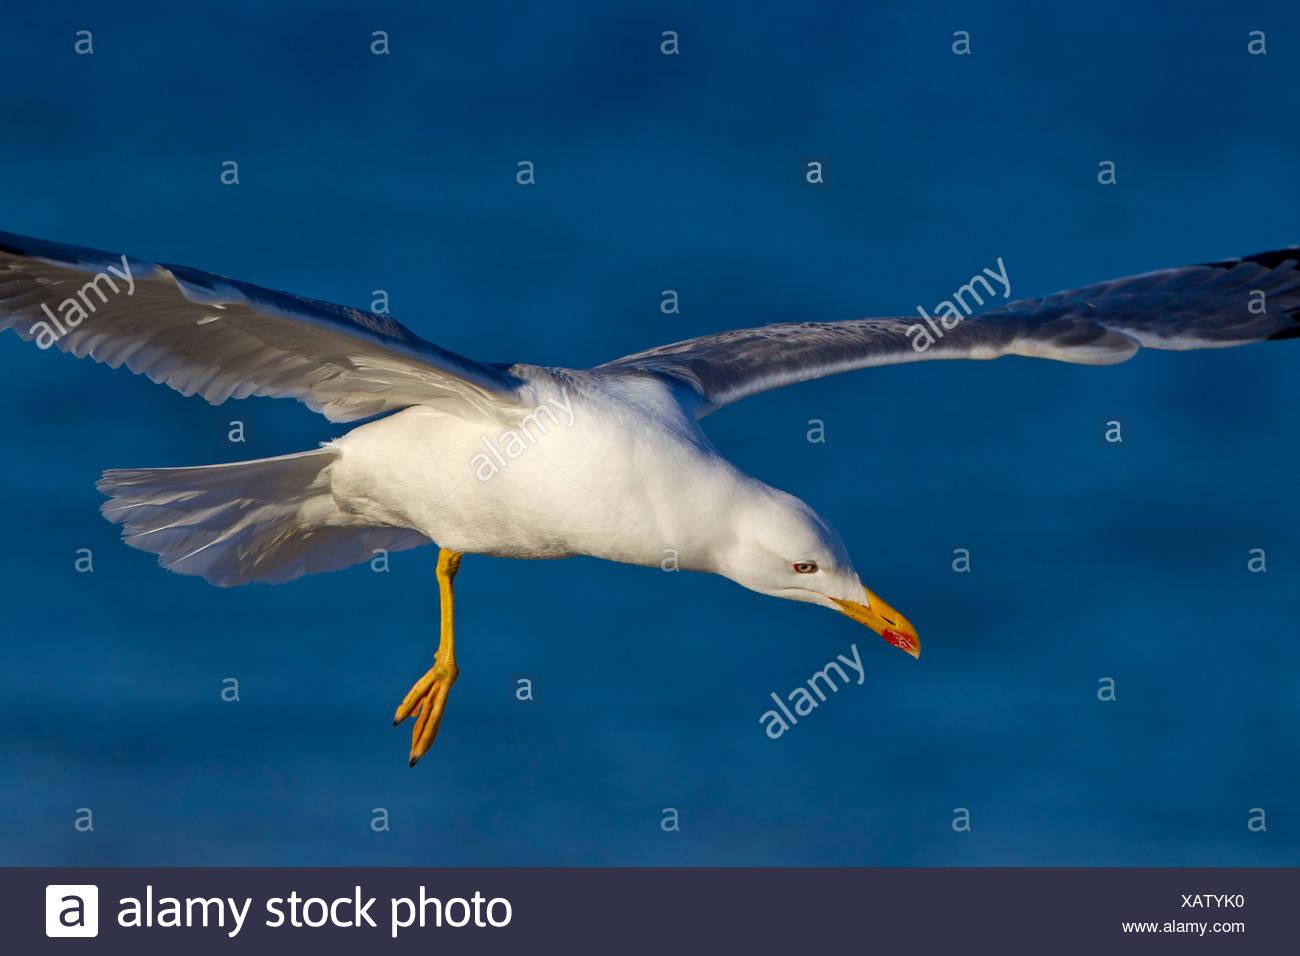 Yellow-legged Gull (Larus michahellis, Larus cachinnans michahellis), flying, Spain, Balearen, Majorca Stock Photo